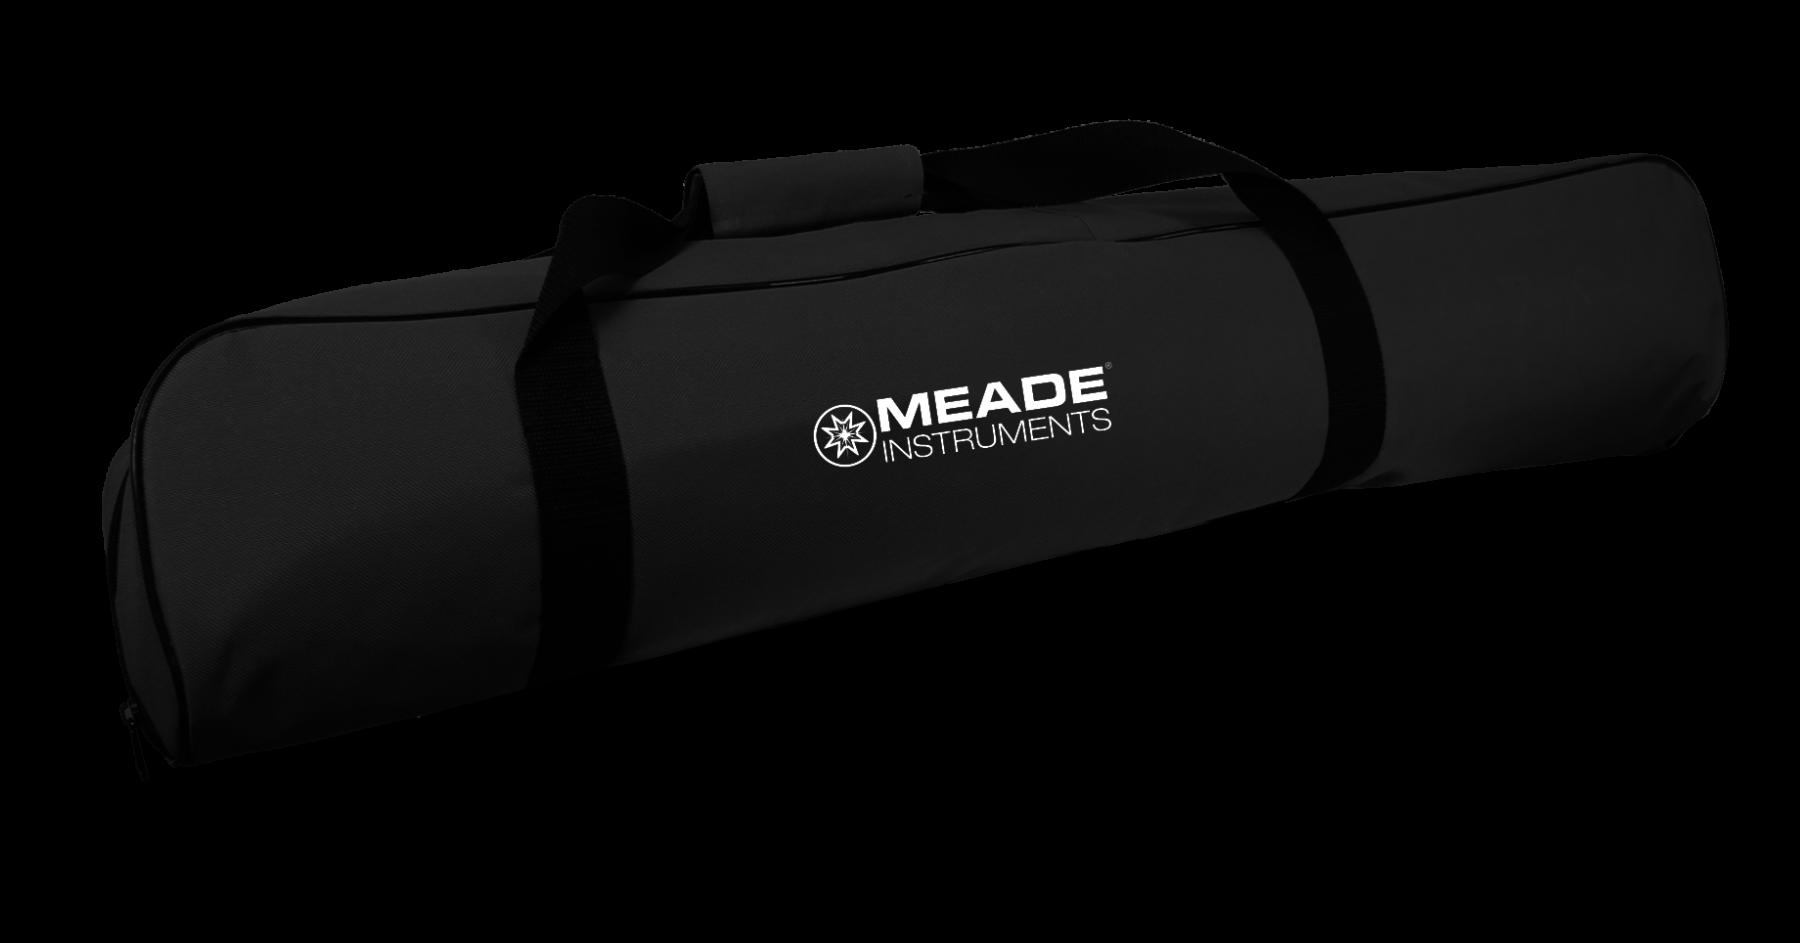 Meade Instruments Telescope Bag (StarNavigator NG 114mm 130mm Reflector) by Meade Instruments